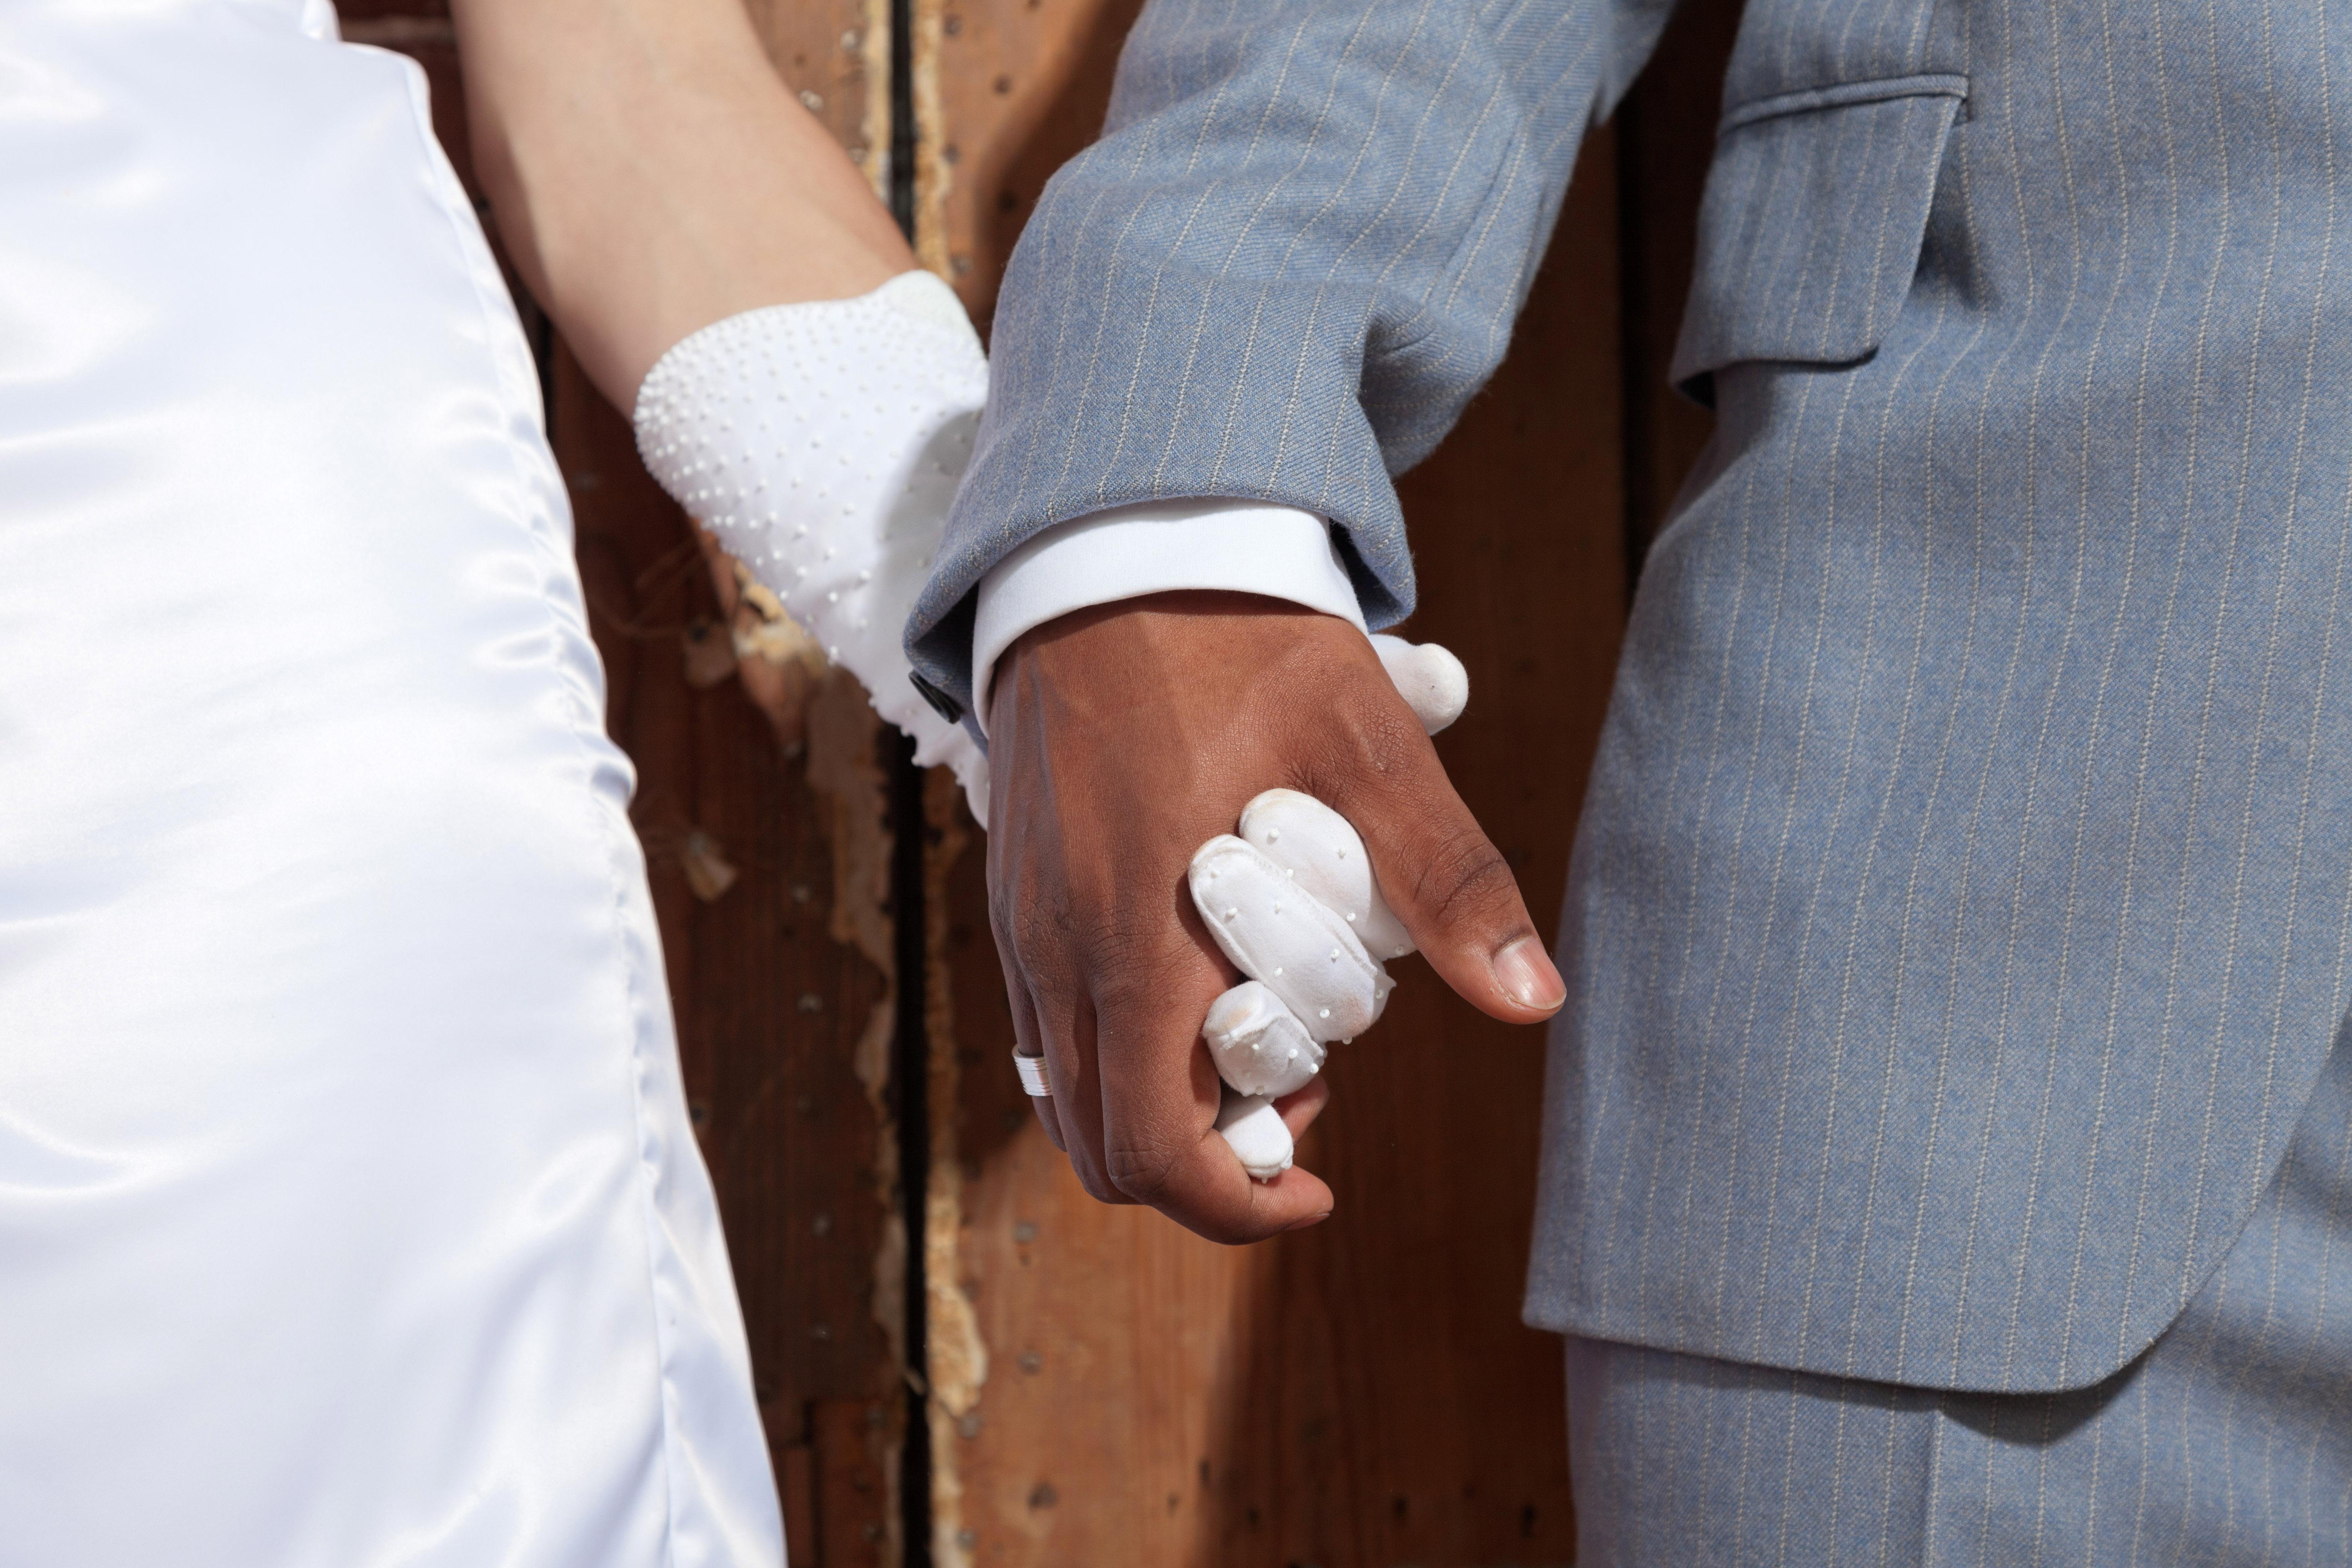 Southall Marriage Bureau Mixedracemarriage